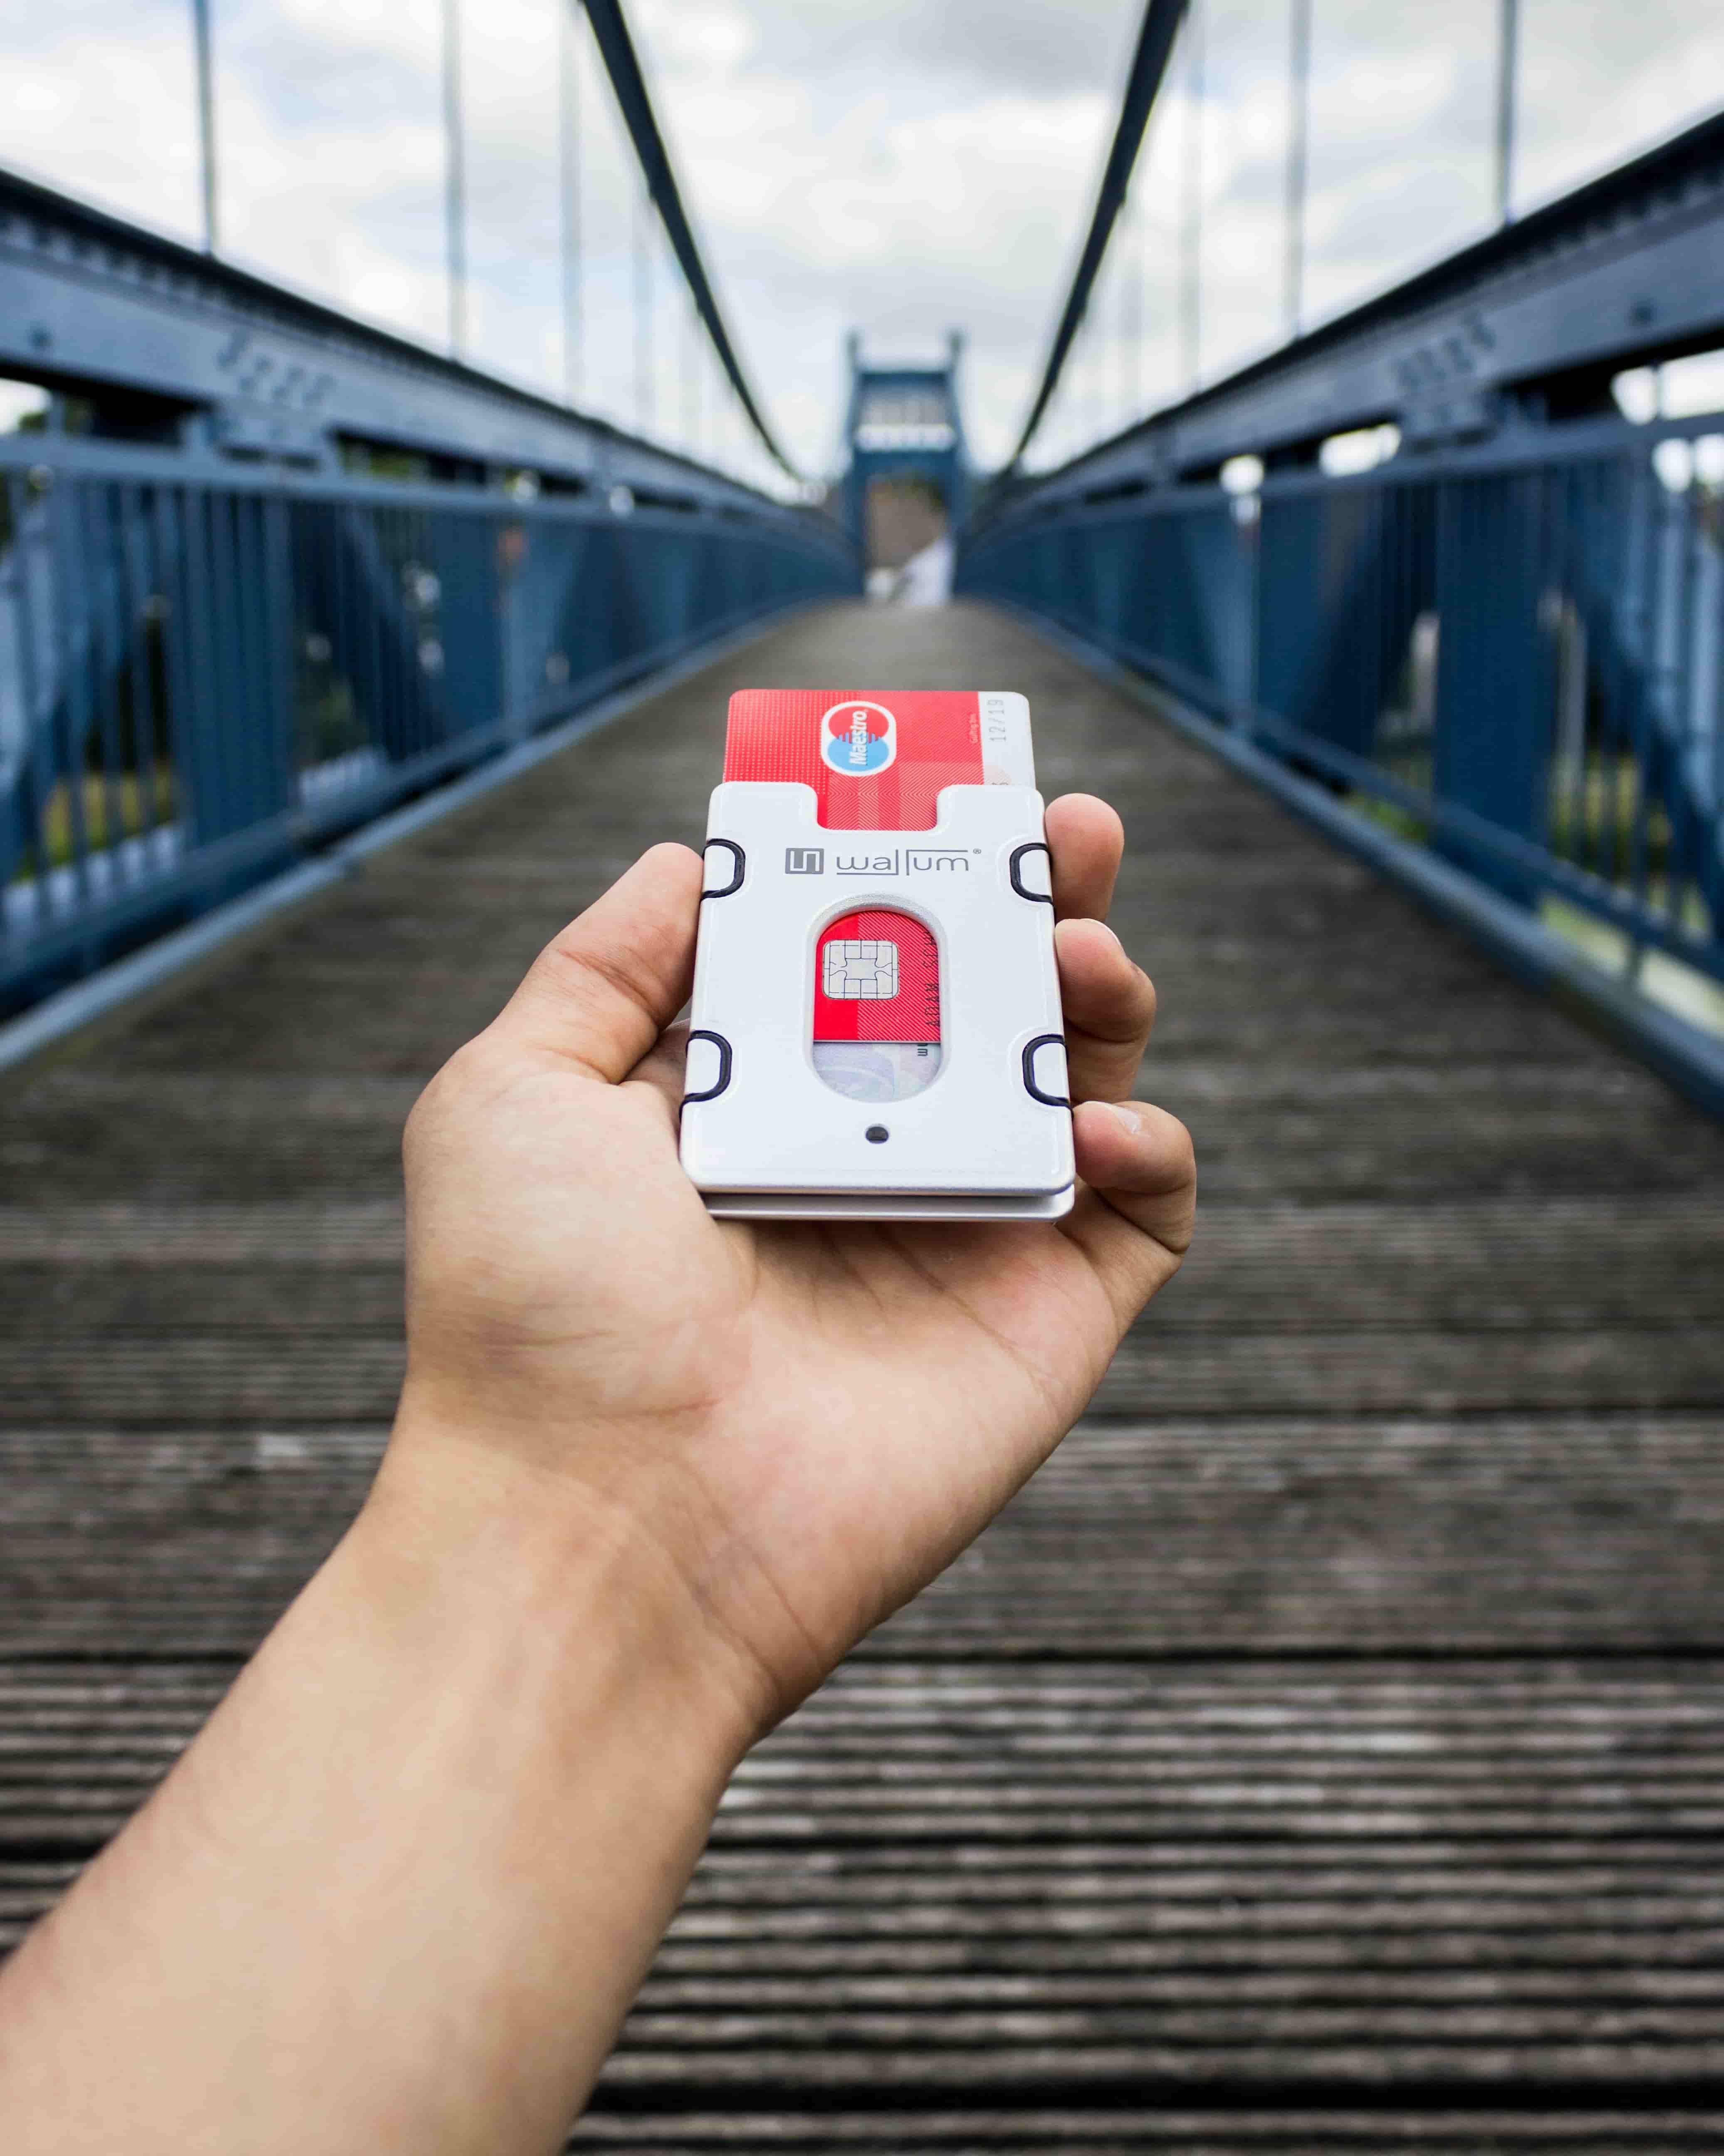 Zneuziti podvod platebni karta ochrana